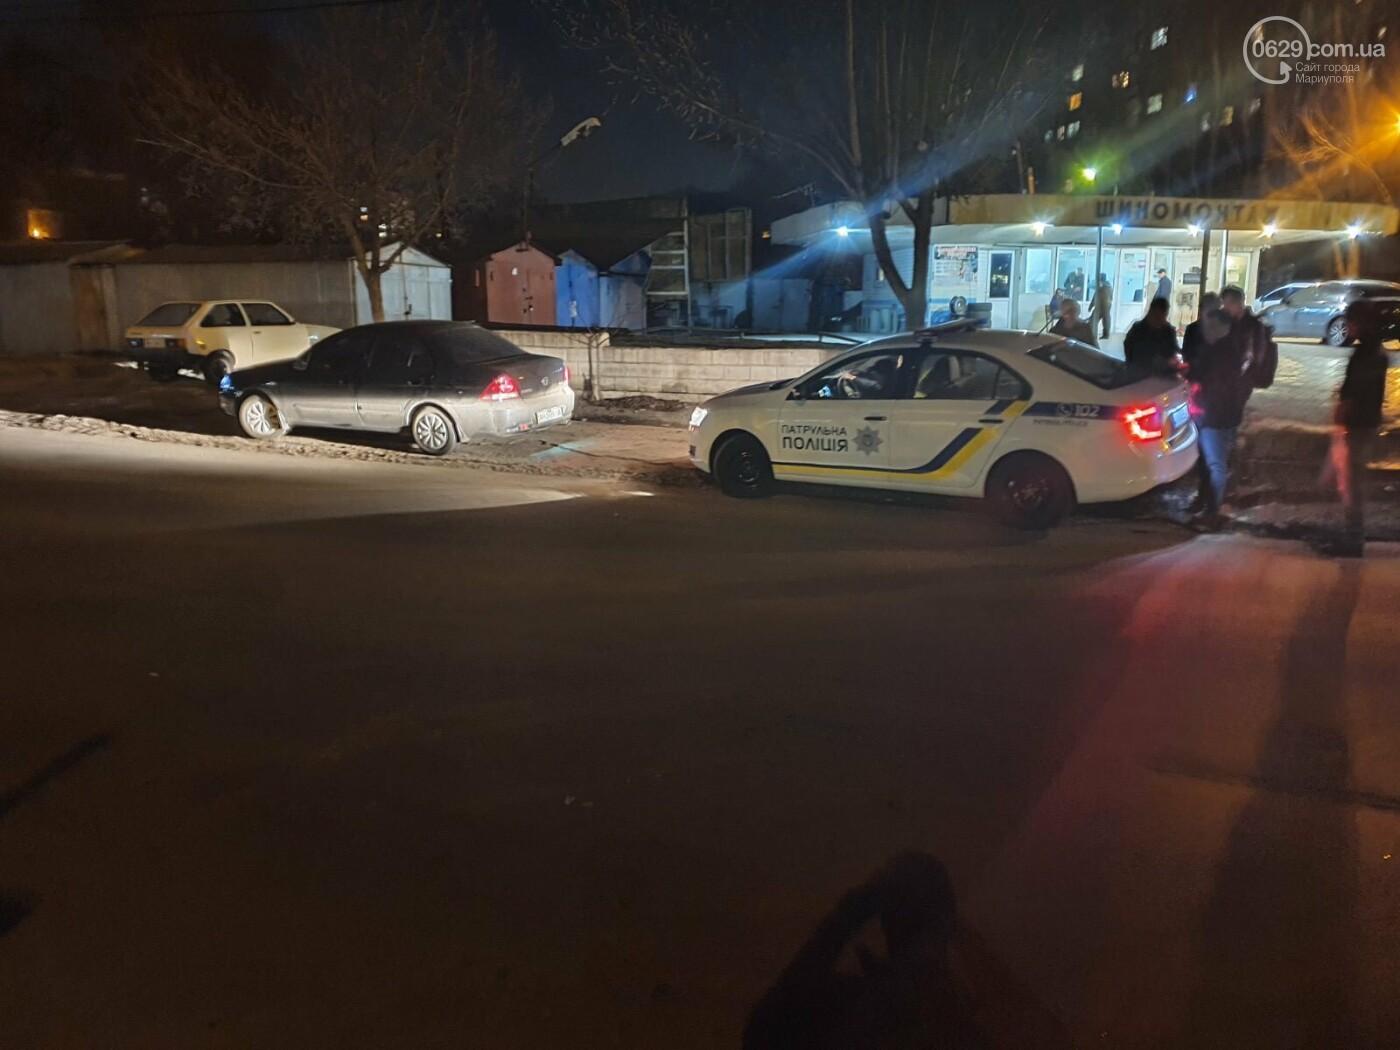 В Мариуполе Nissan сбил девушку на «зебре», - ФОТО, фото-2